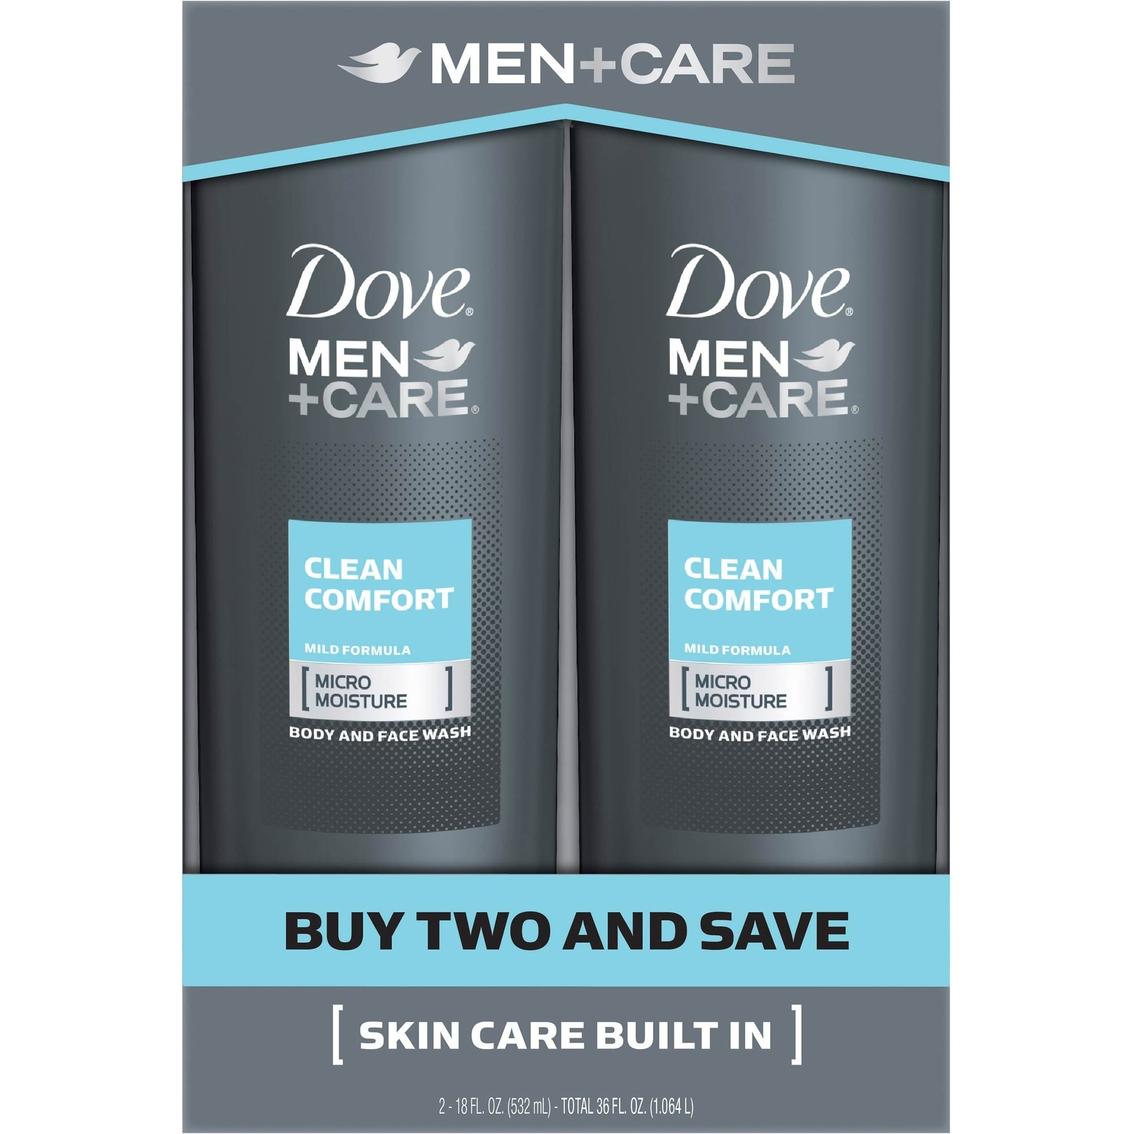 Dove Men Care Clean Comfort Body Wash 2 Pk Body Hair Care Beauty Health Shop The Exchange